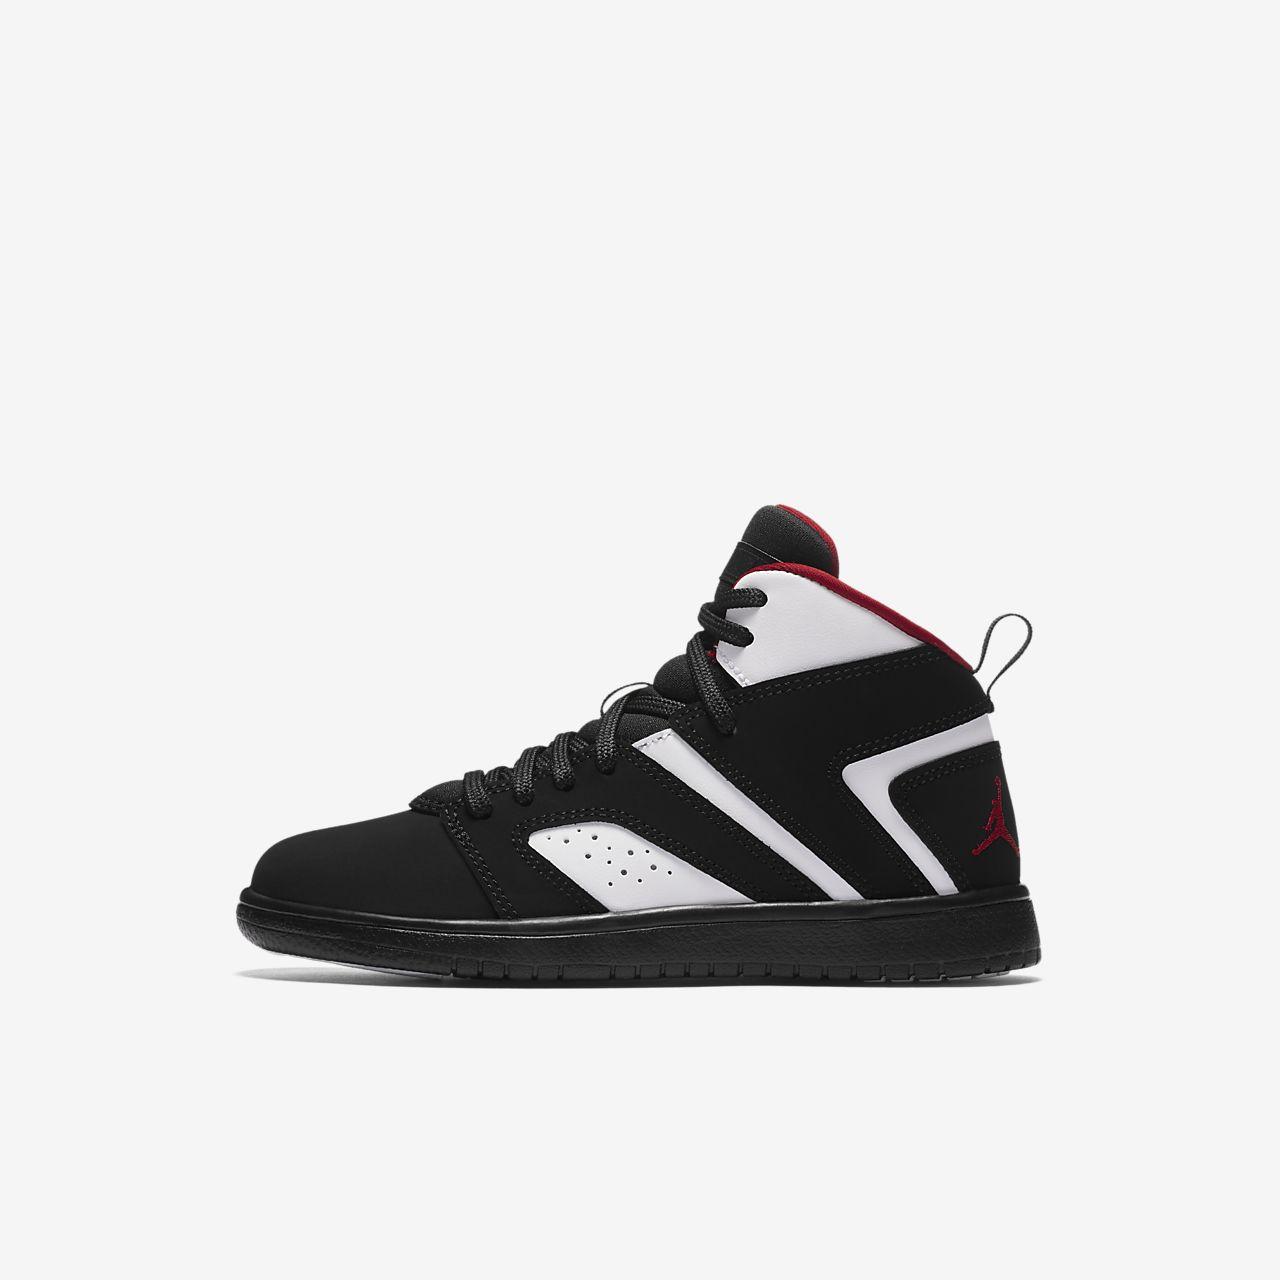 nike jordan shoes flight black nz